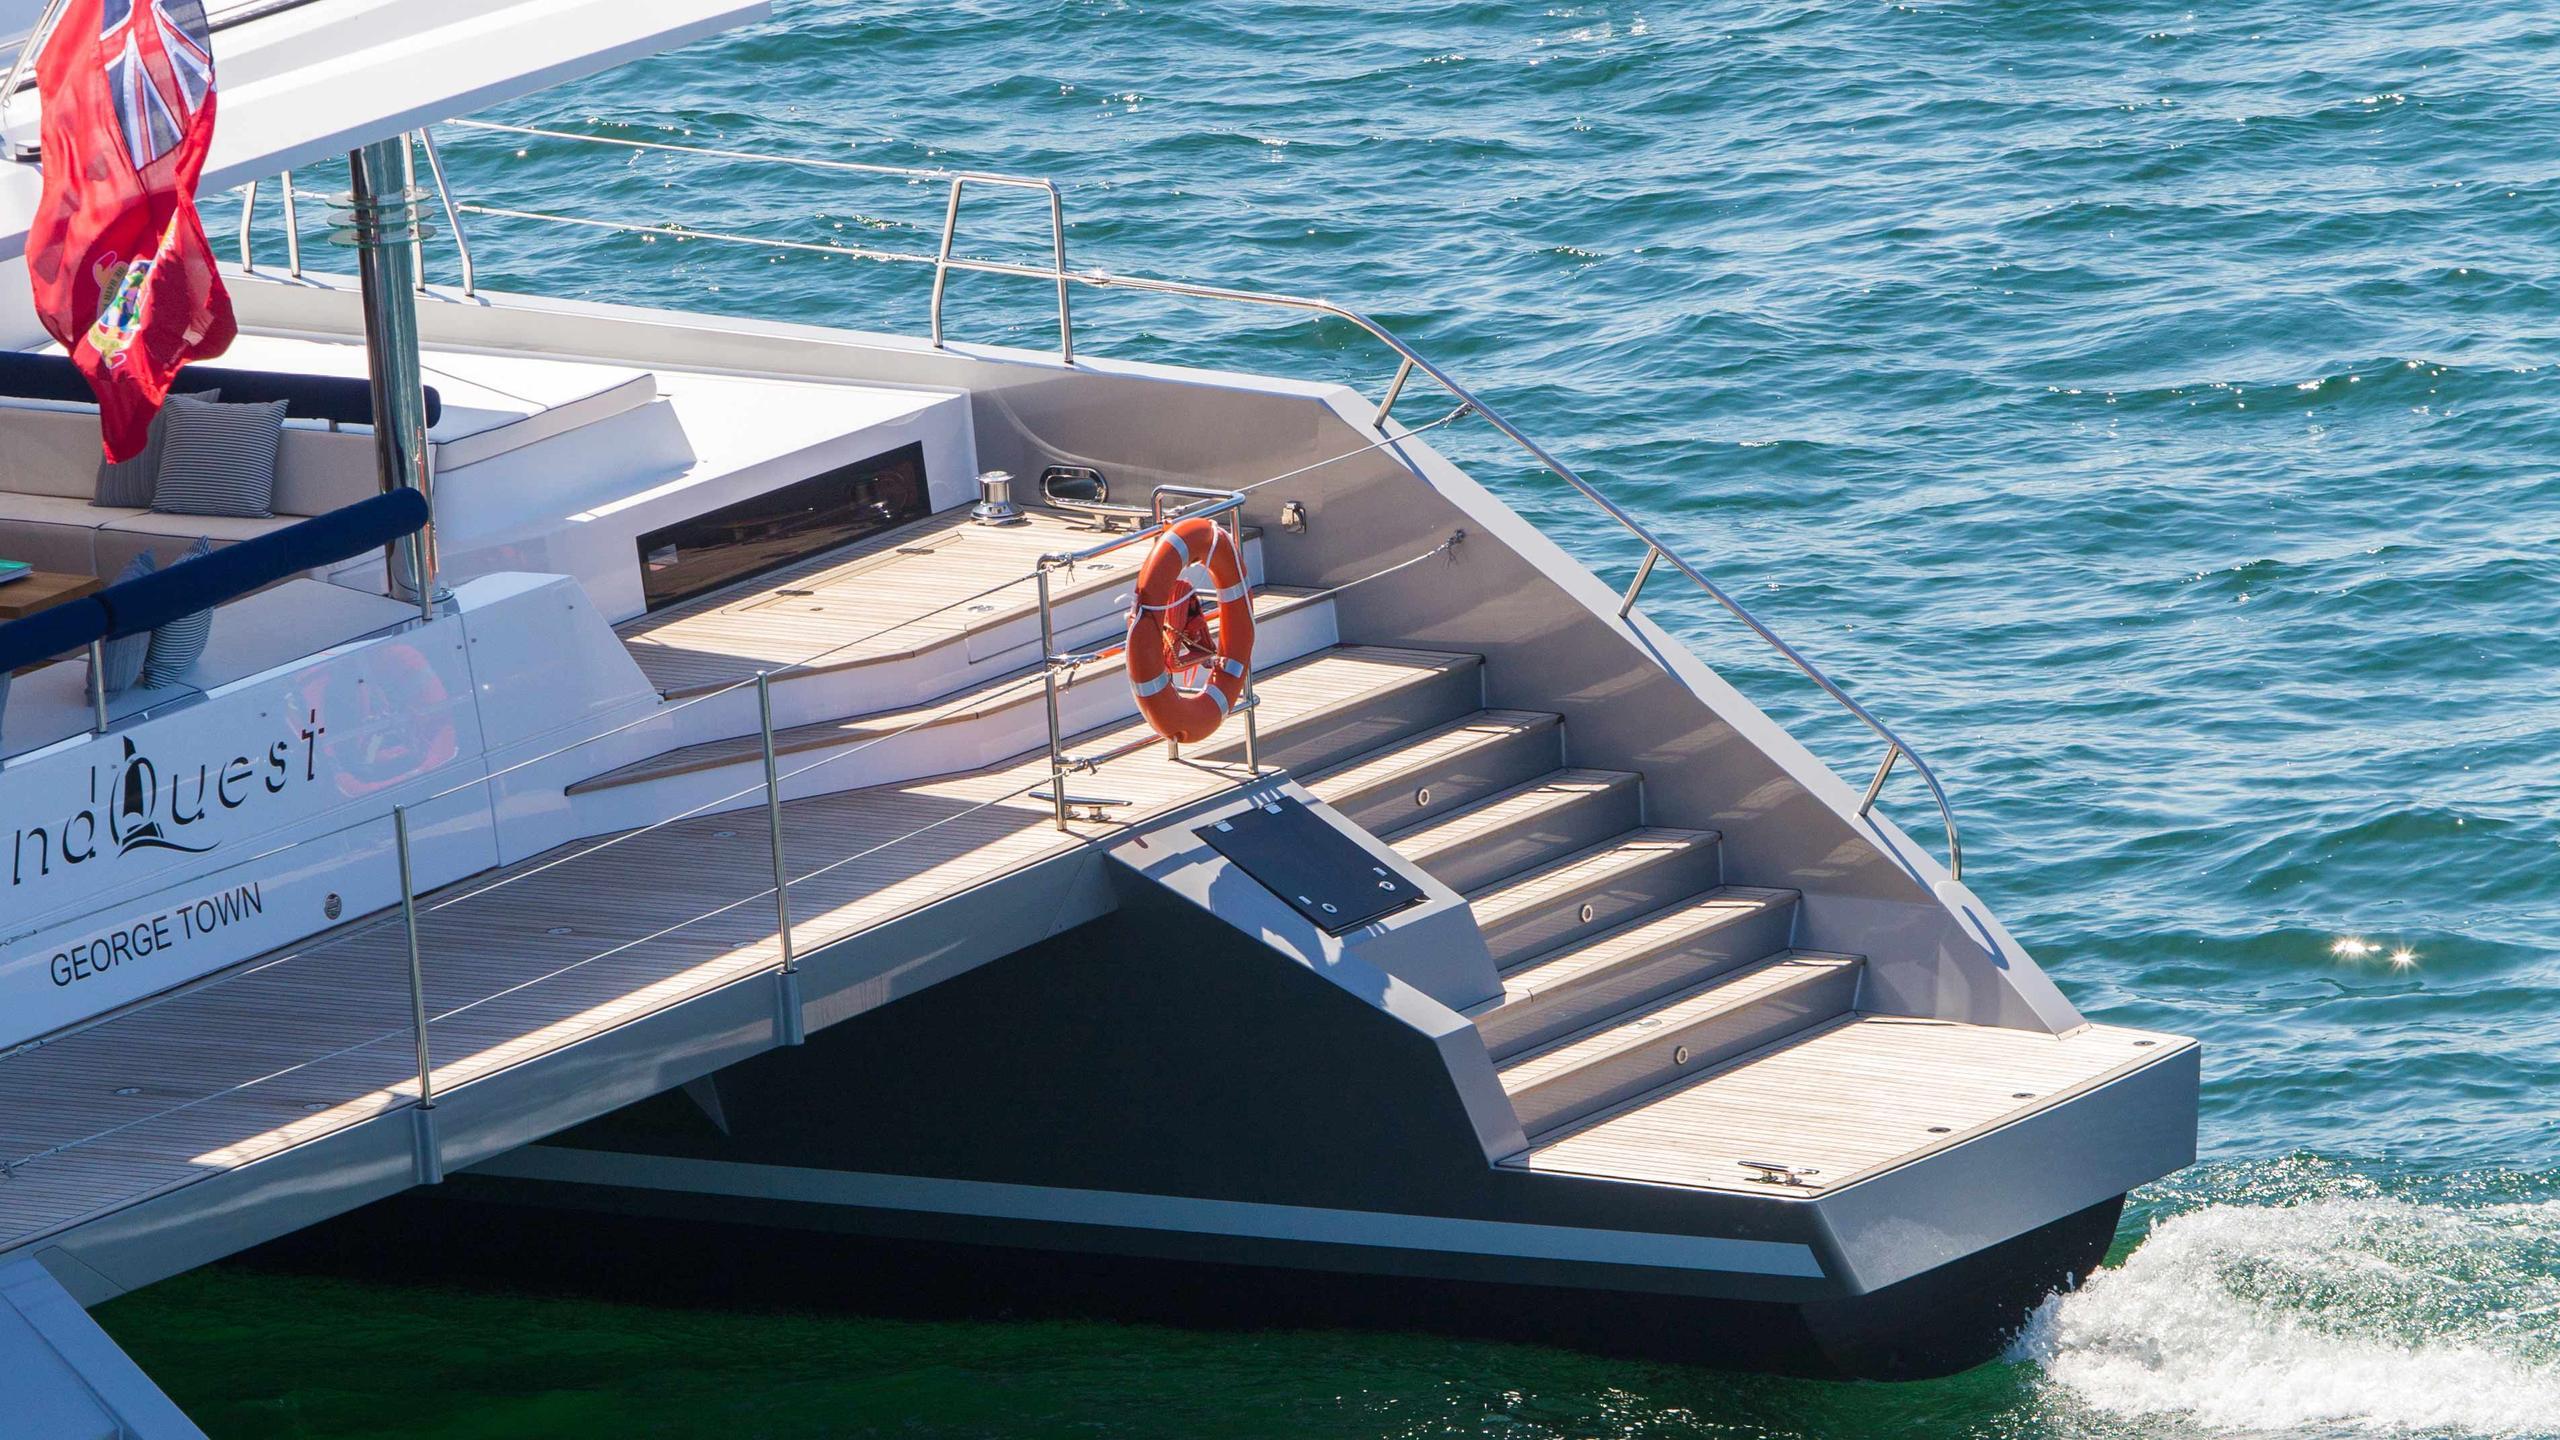 Windquest-catamaran-yacht-jfa-2014-26m-profile-stern